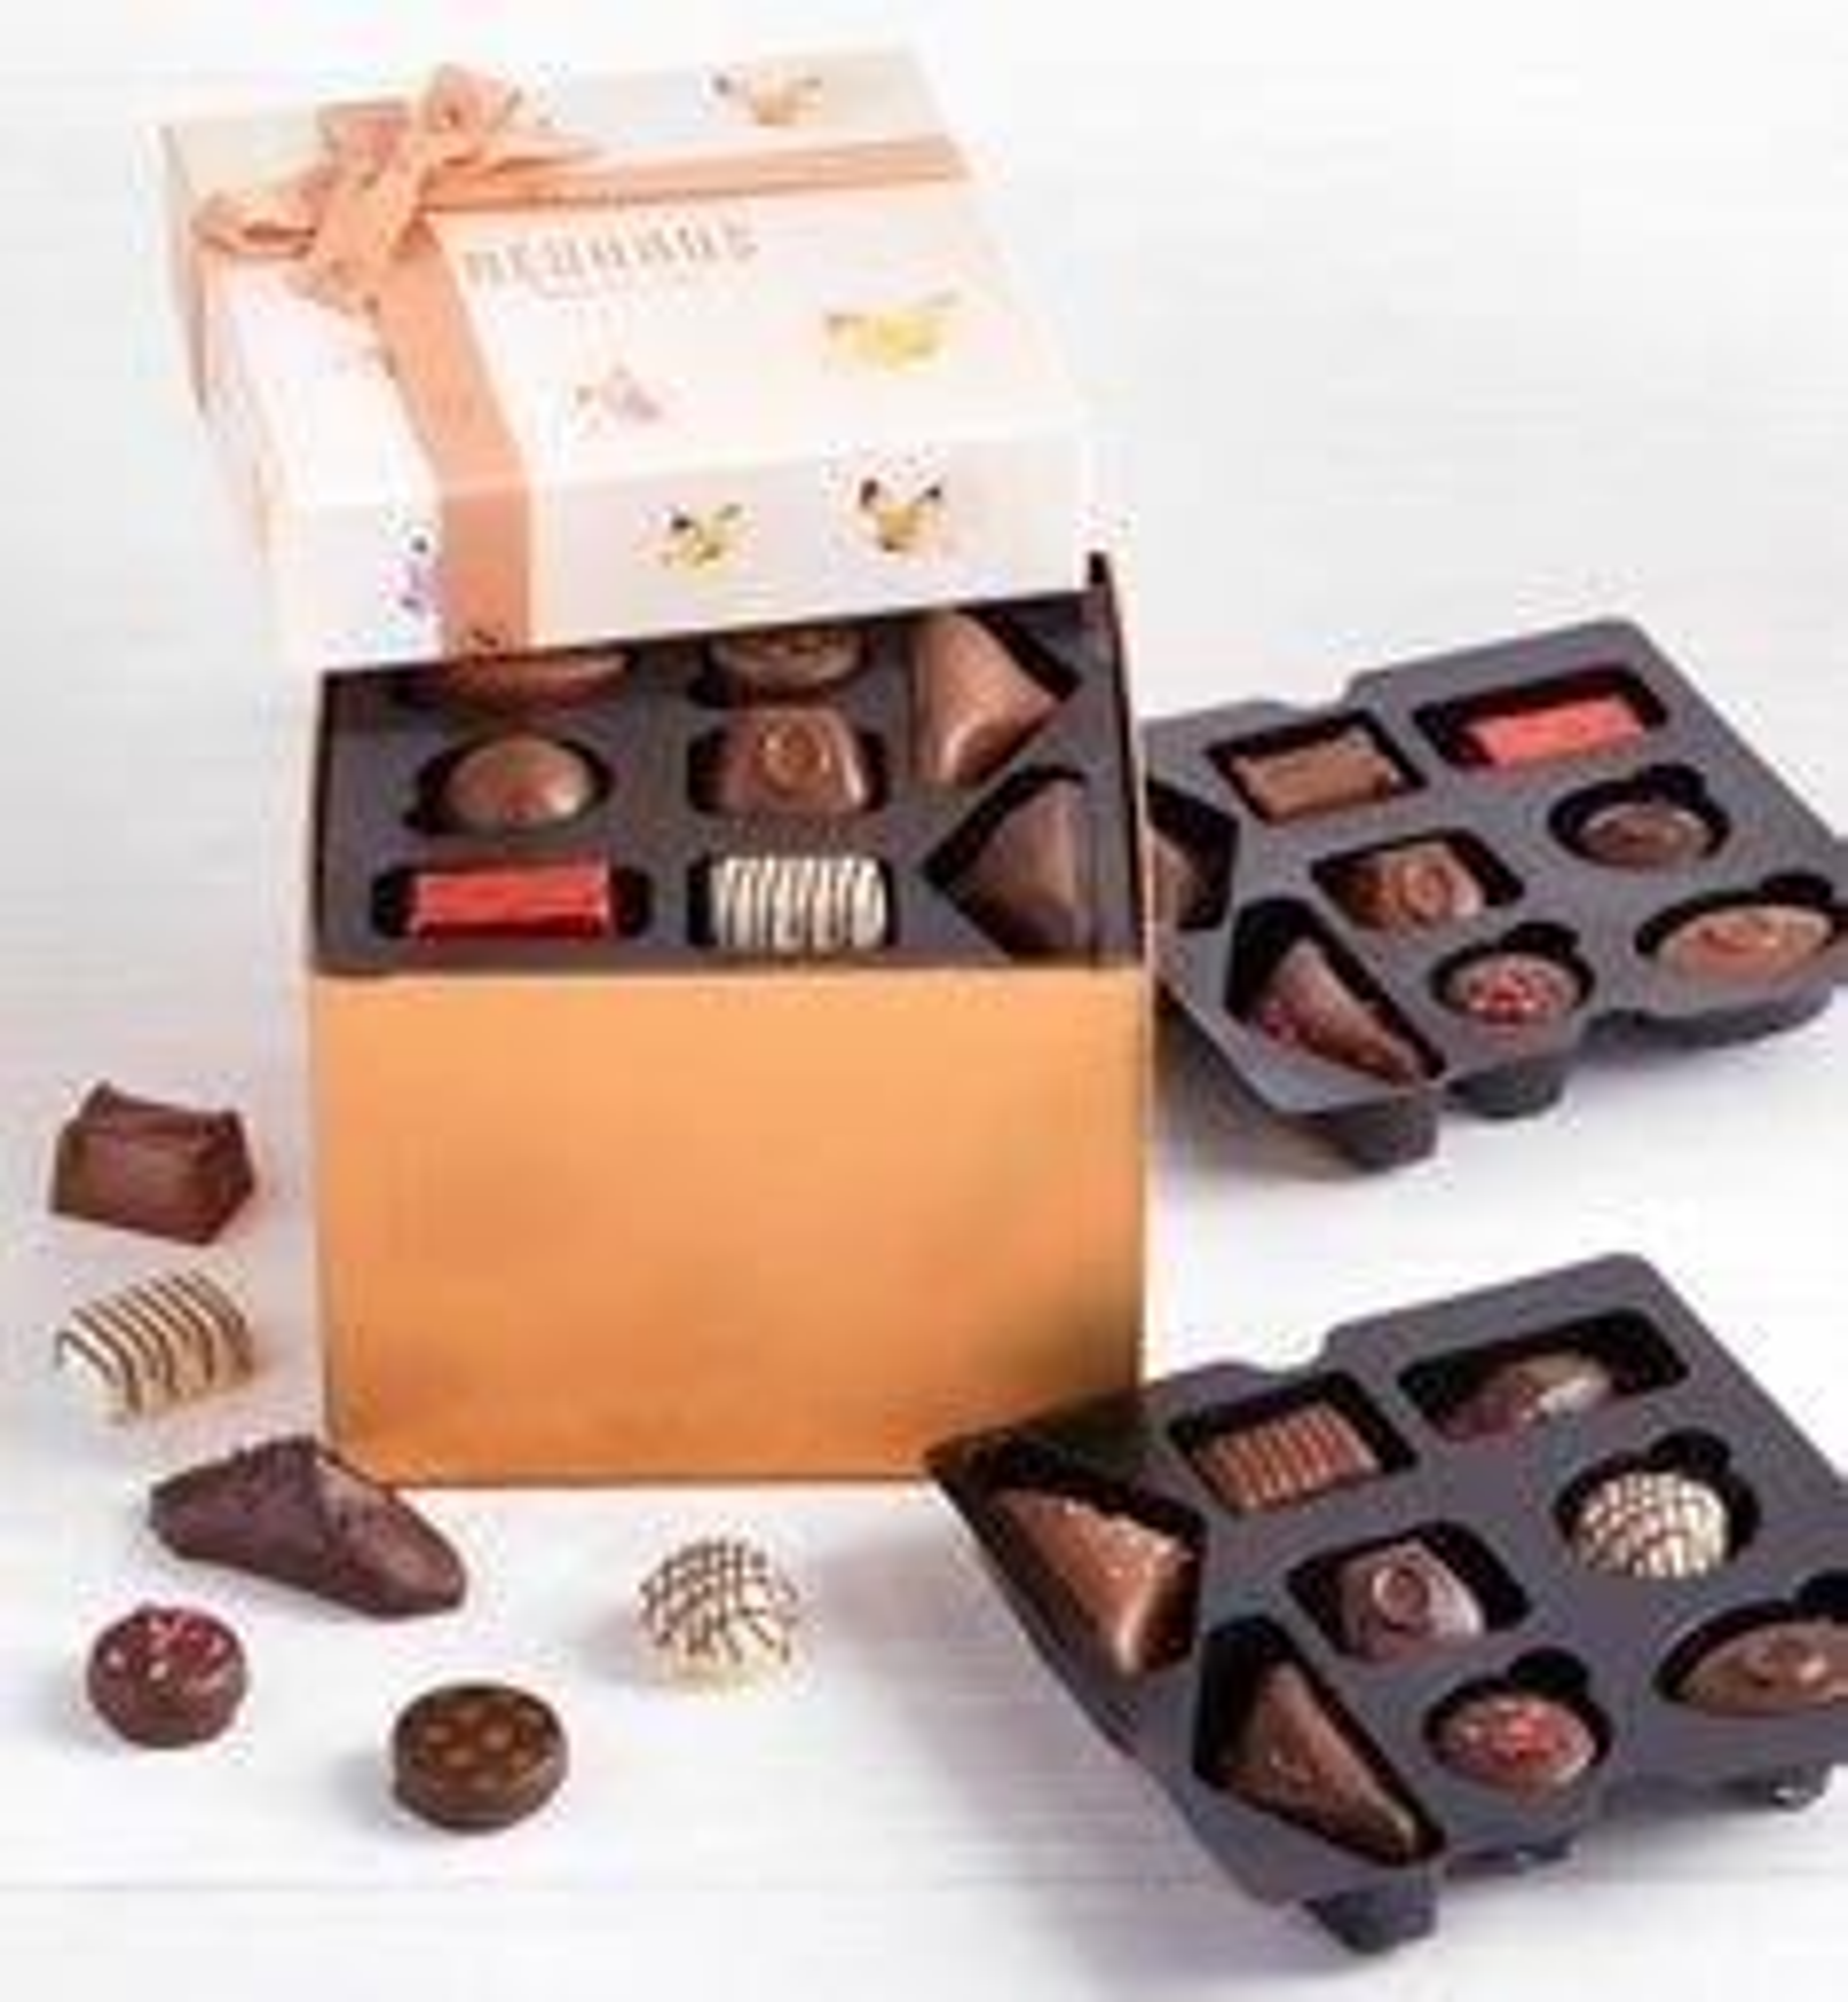 Neuhaus Chocolates Spring Gift Box pc